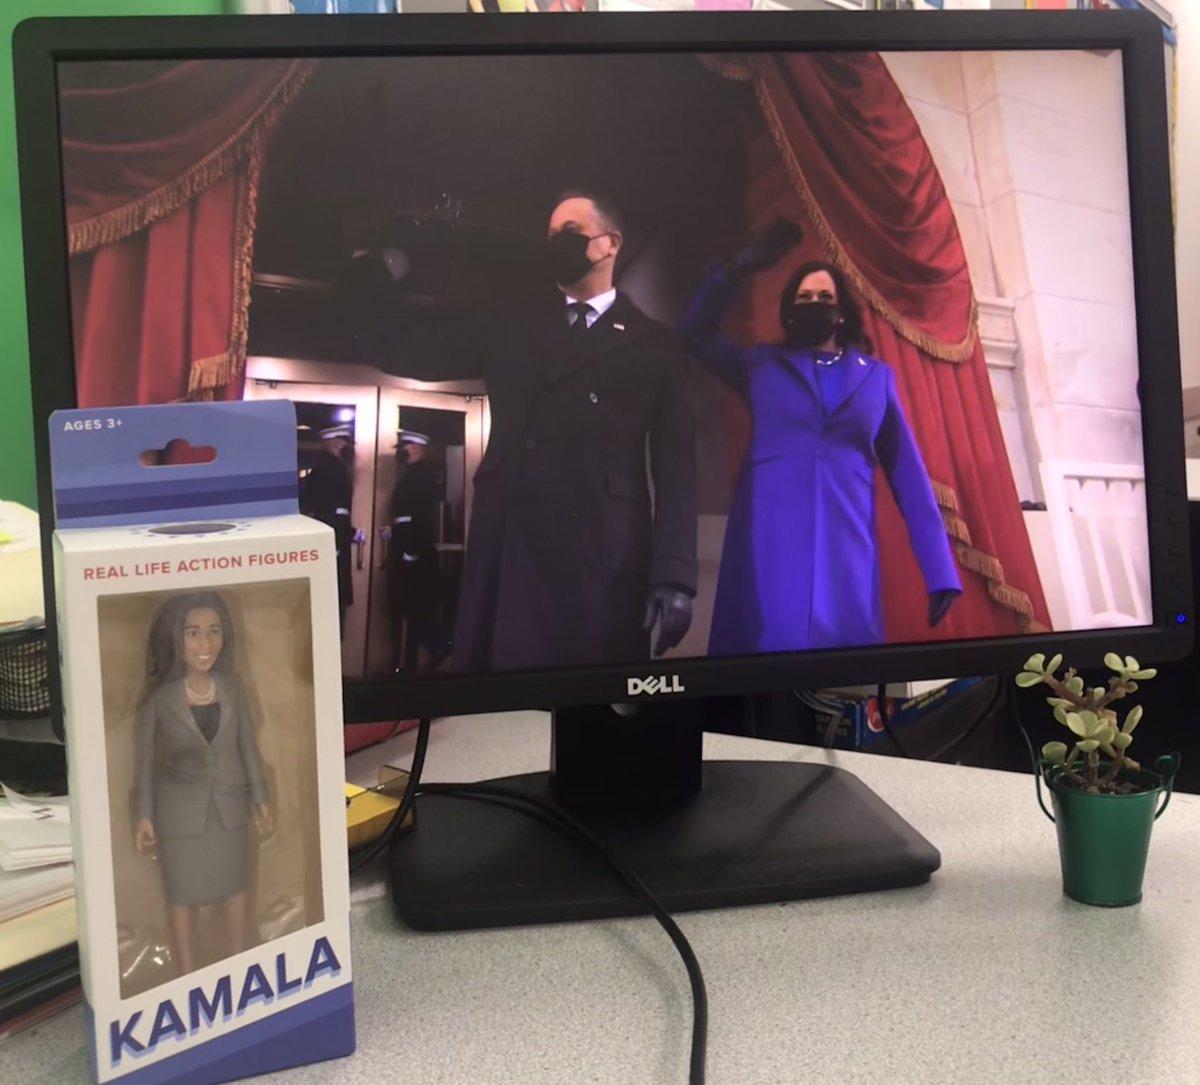 #InaugurationDay #BidenHarrisInauguration #KamalaHarrisMakingHistory